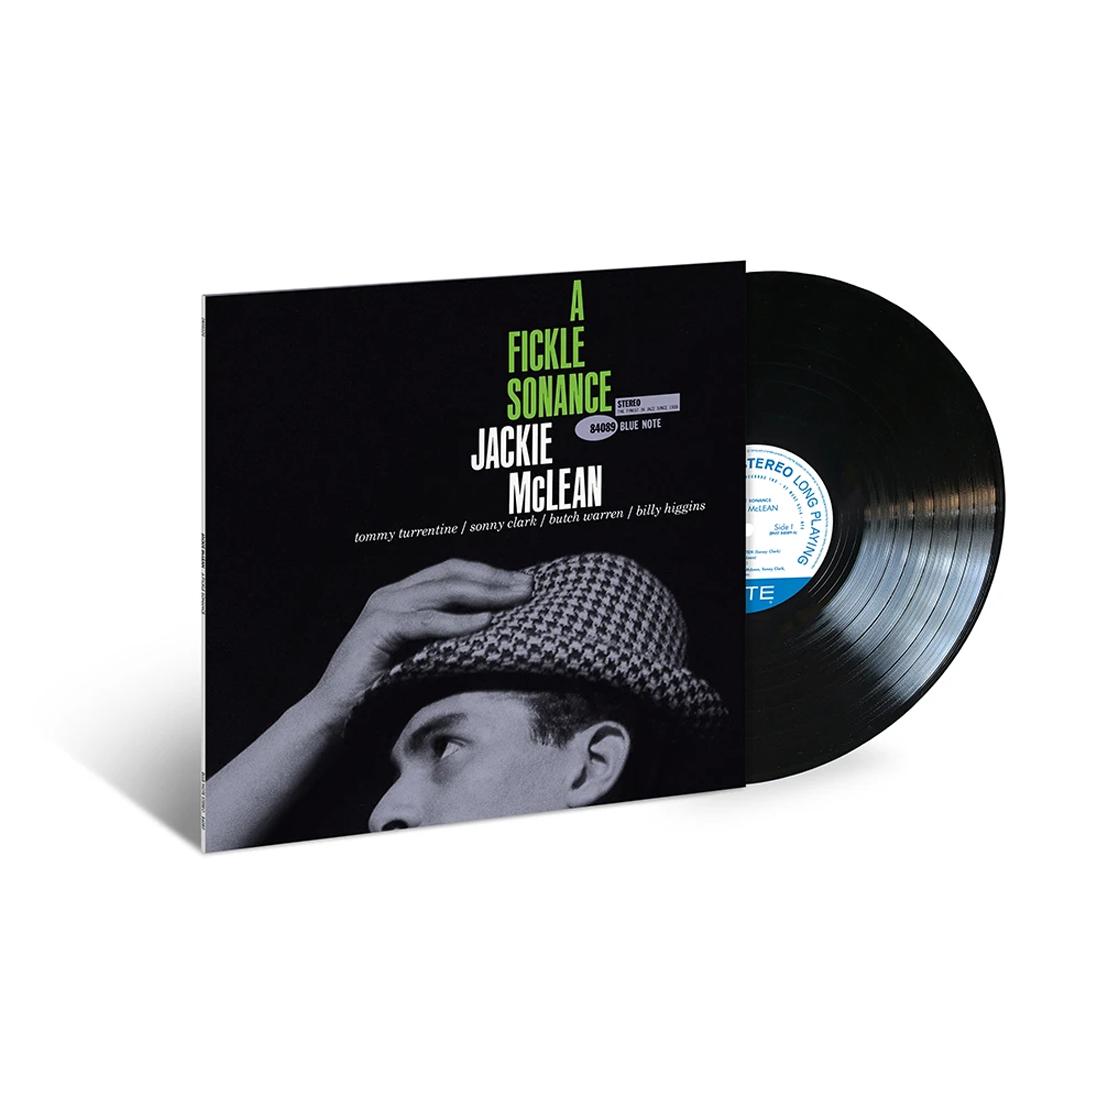 Blue Note Jackie McLean - A Fickle Sonance